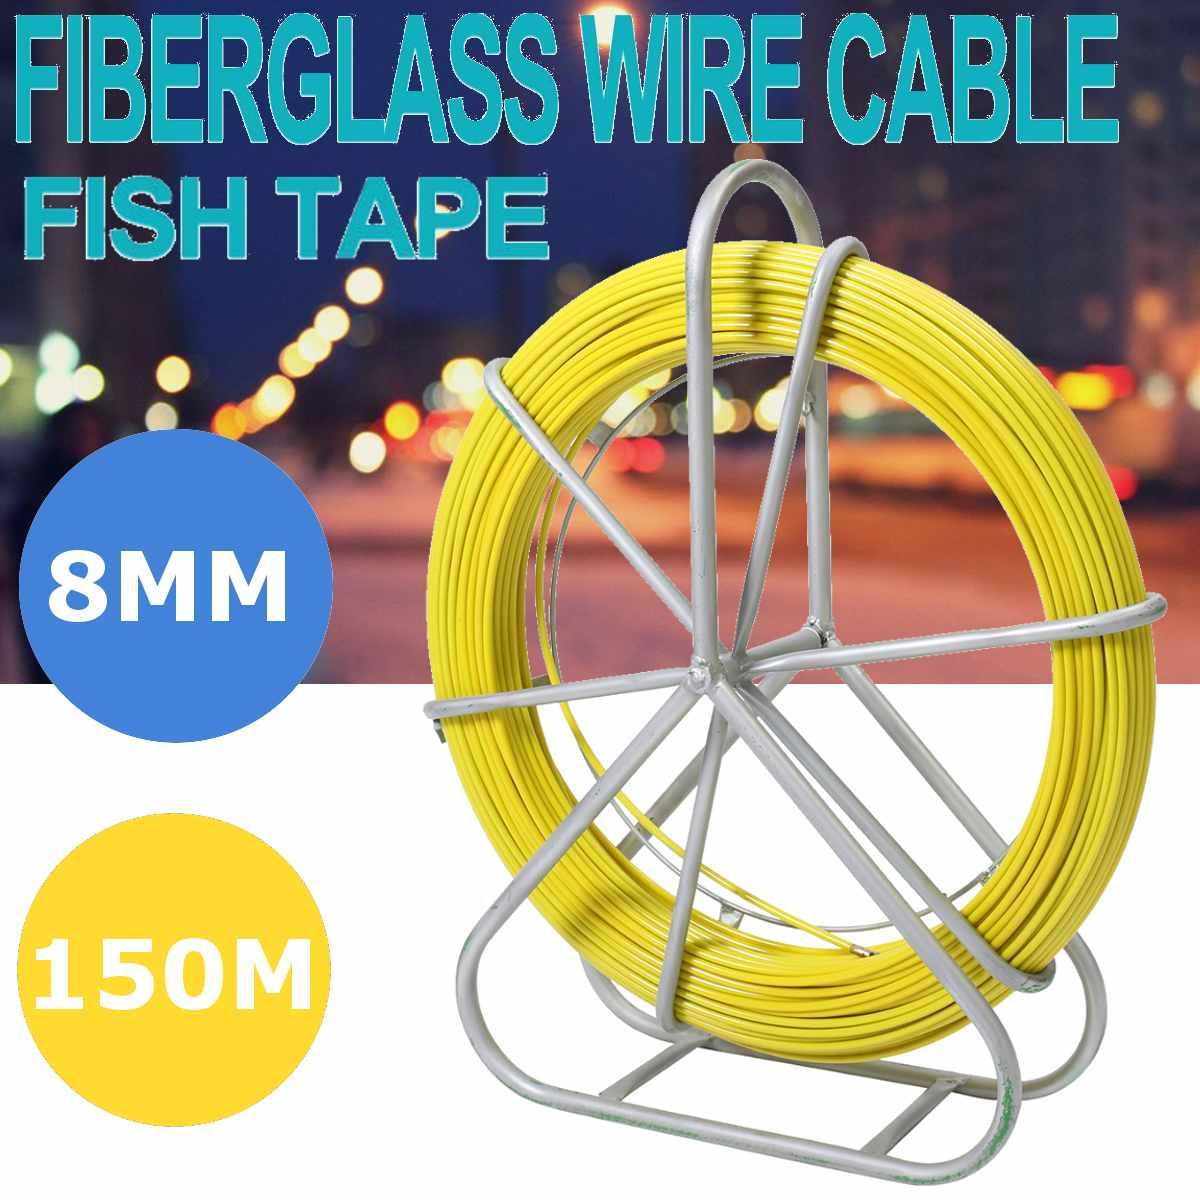 8mm 150 M câble en fibre de verre fil tige de course serpent poisson rotatif extracteur Flexi plomb électrique en fibre de verre fil câble de course tige extracteur